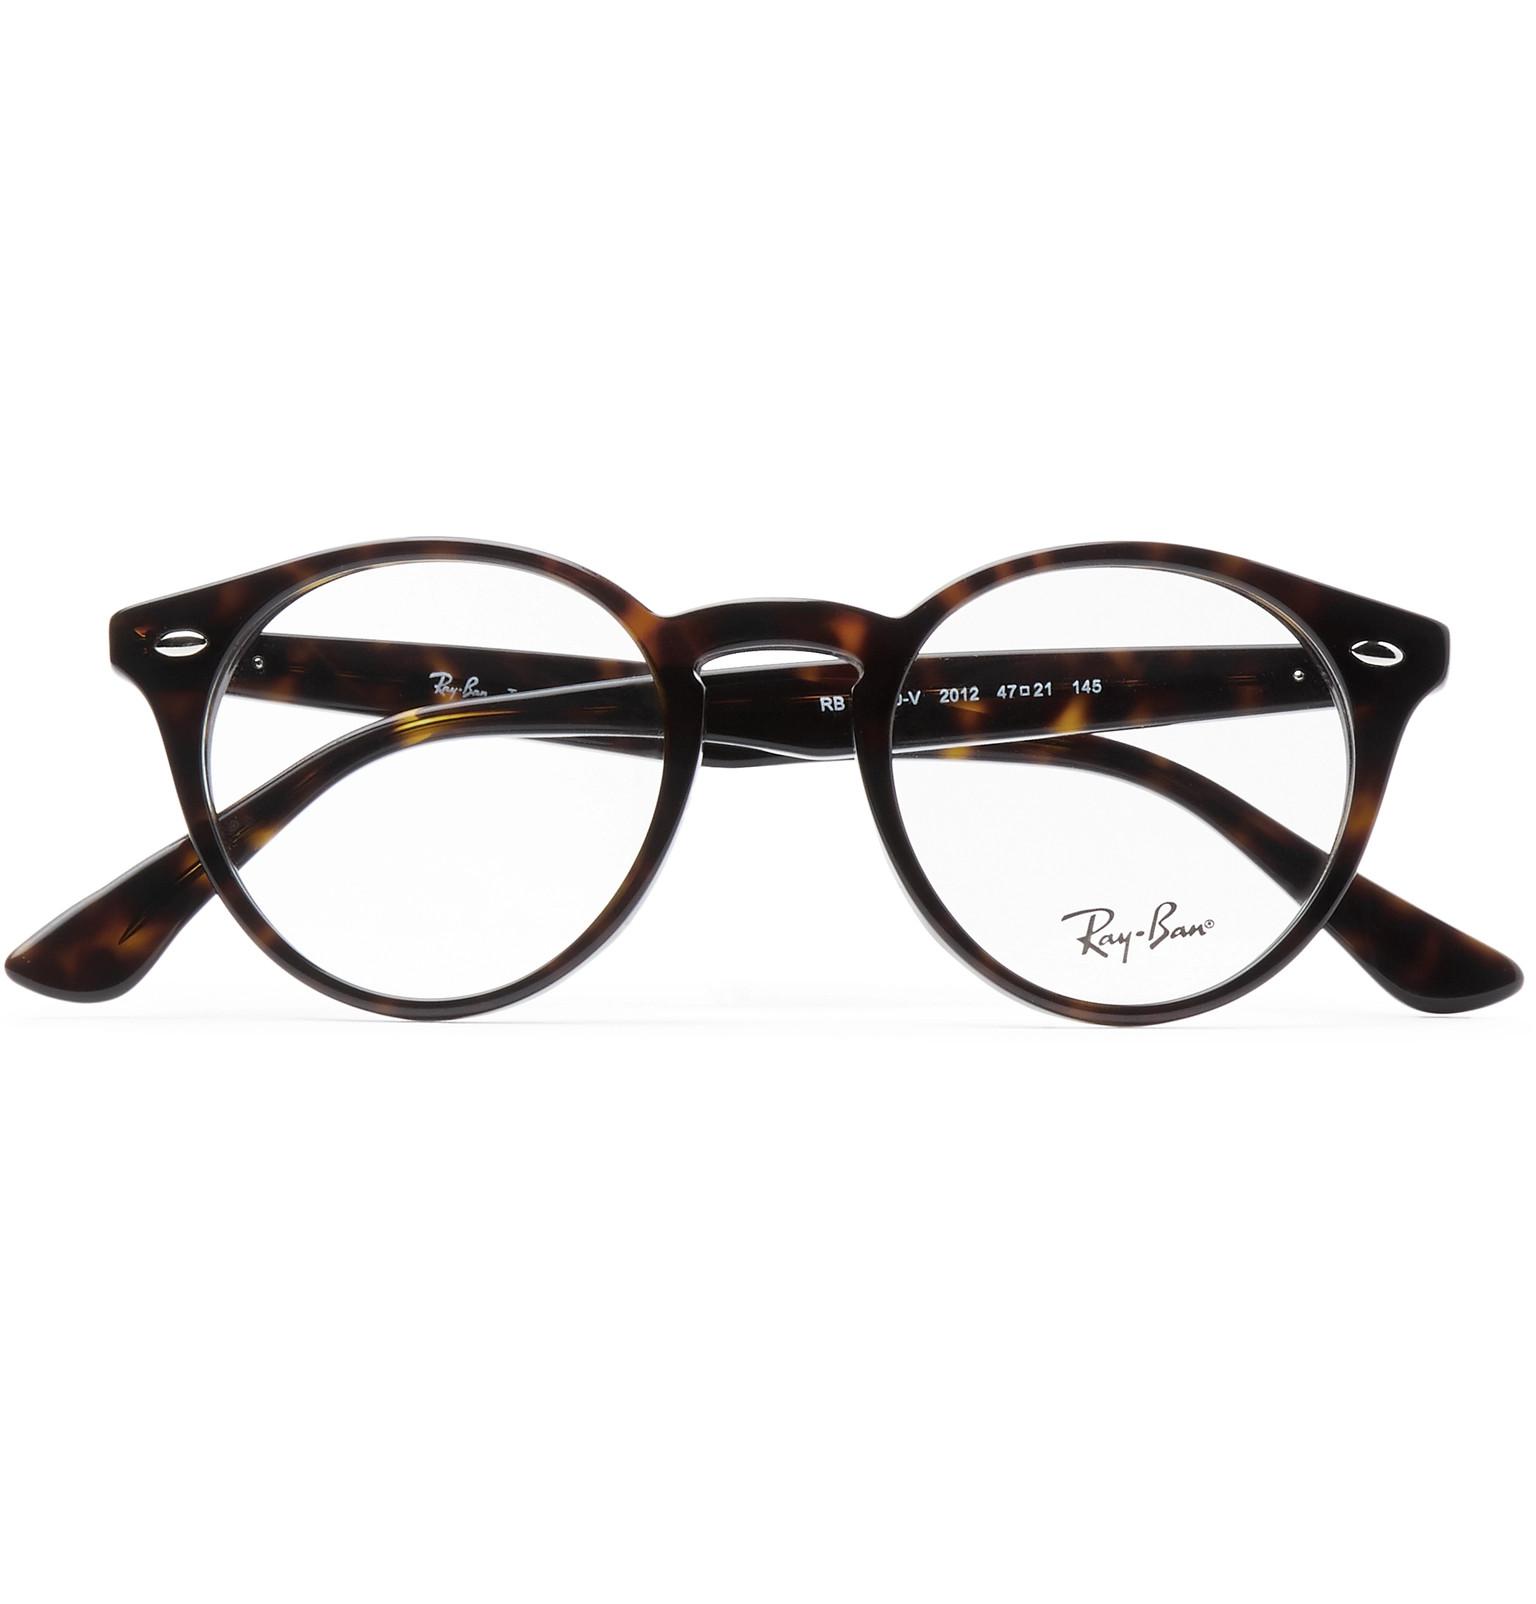 7627bd7f101 Ray-Ban - Round-Frame Tortoiseshell Acetate Optical Glasses